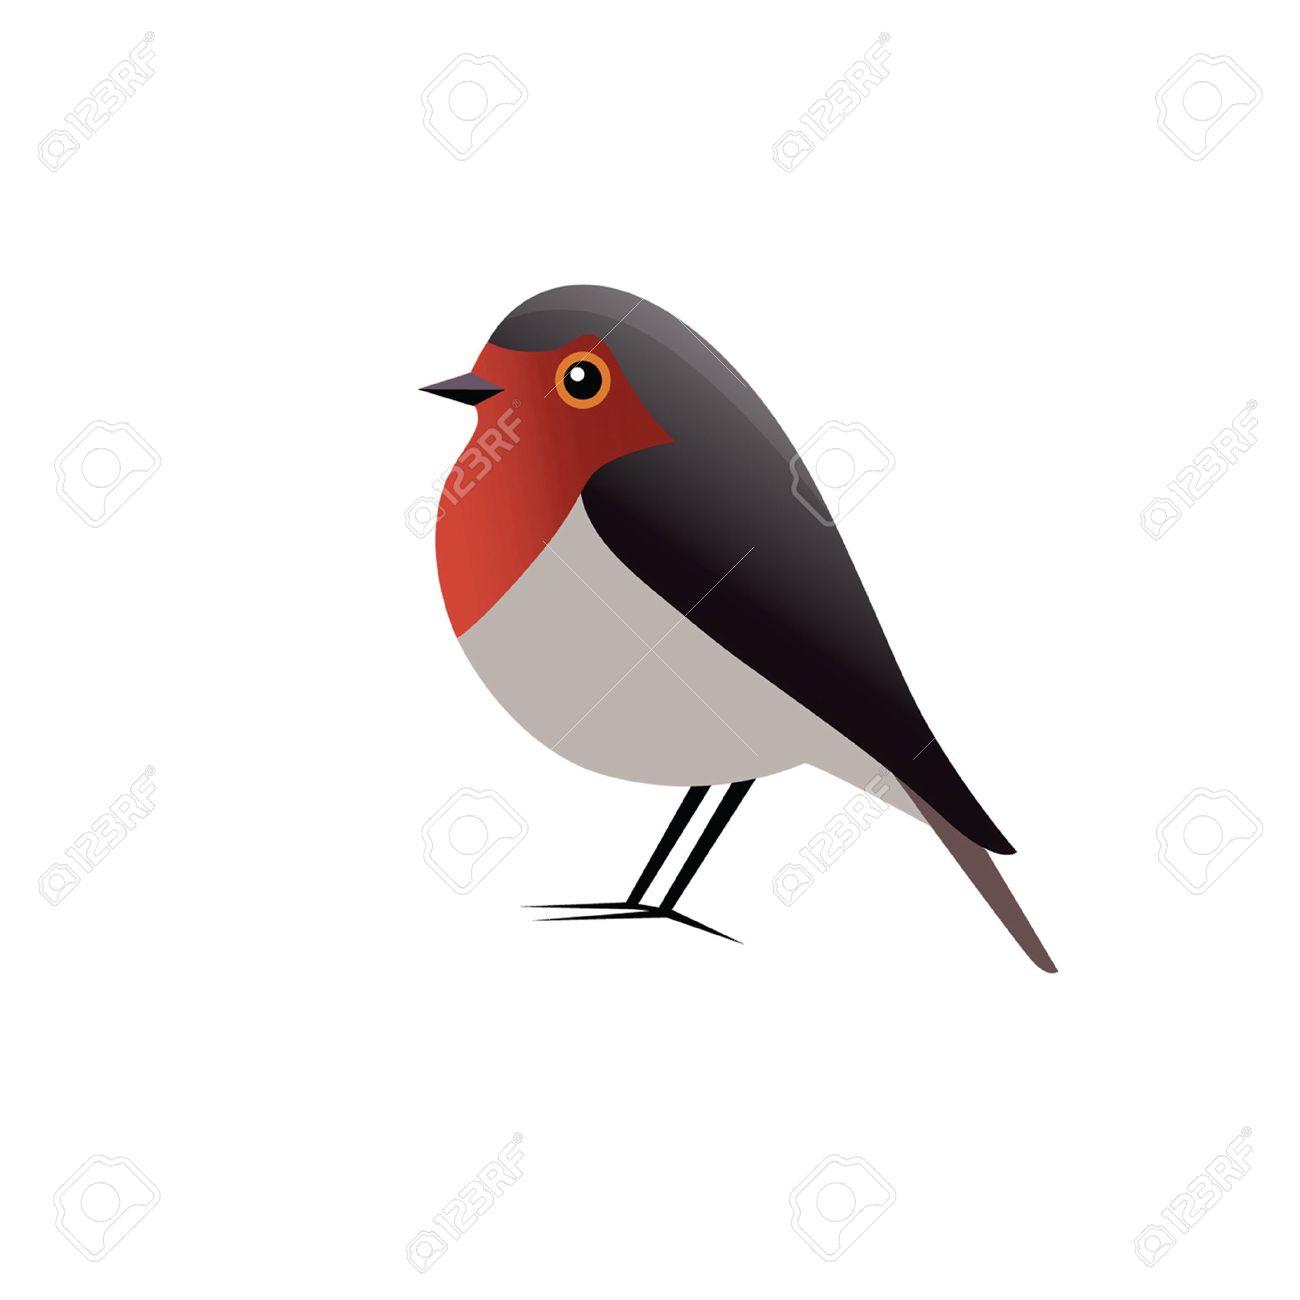 robin bird vector clipart royalty free cliparts vectors and stock rh 123rf com bird vector art bird vector graphics